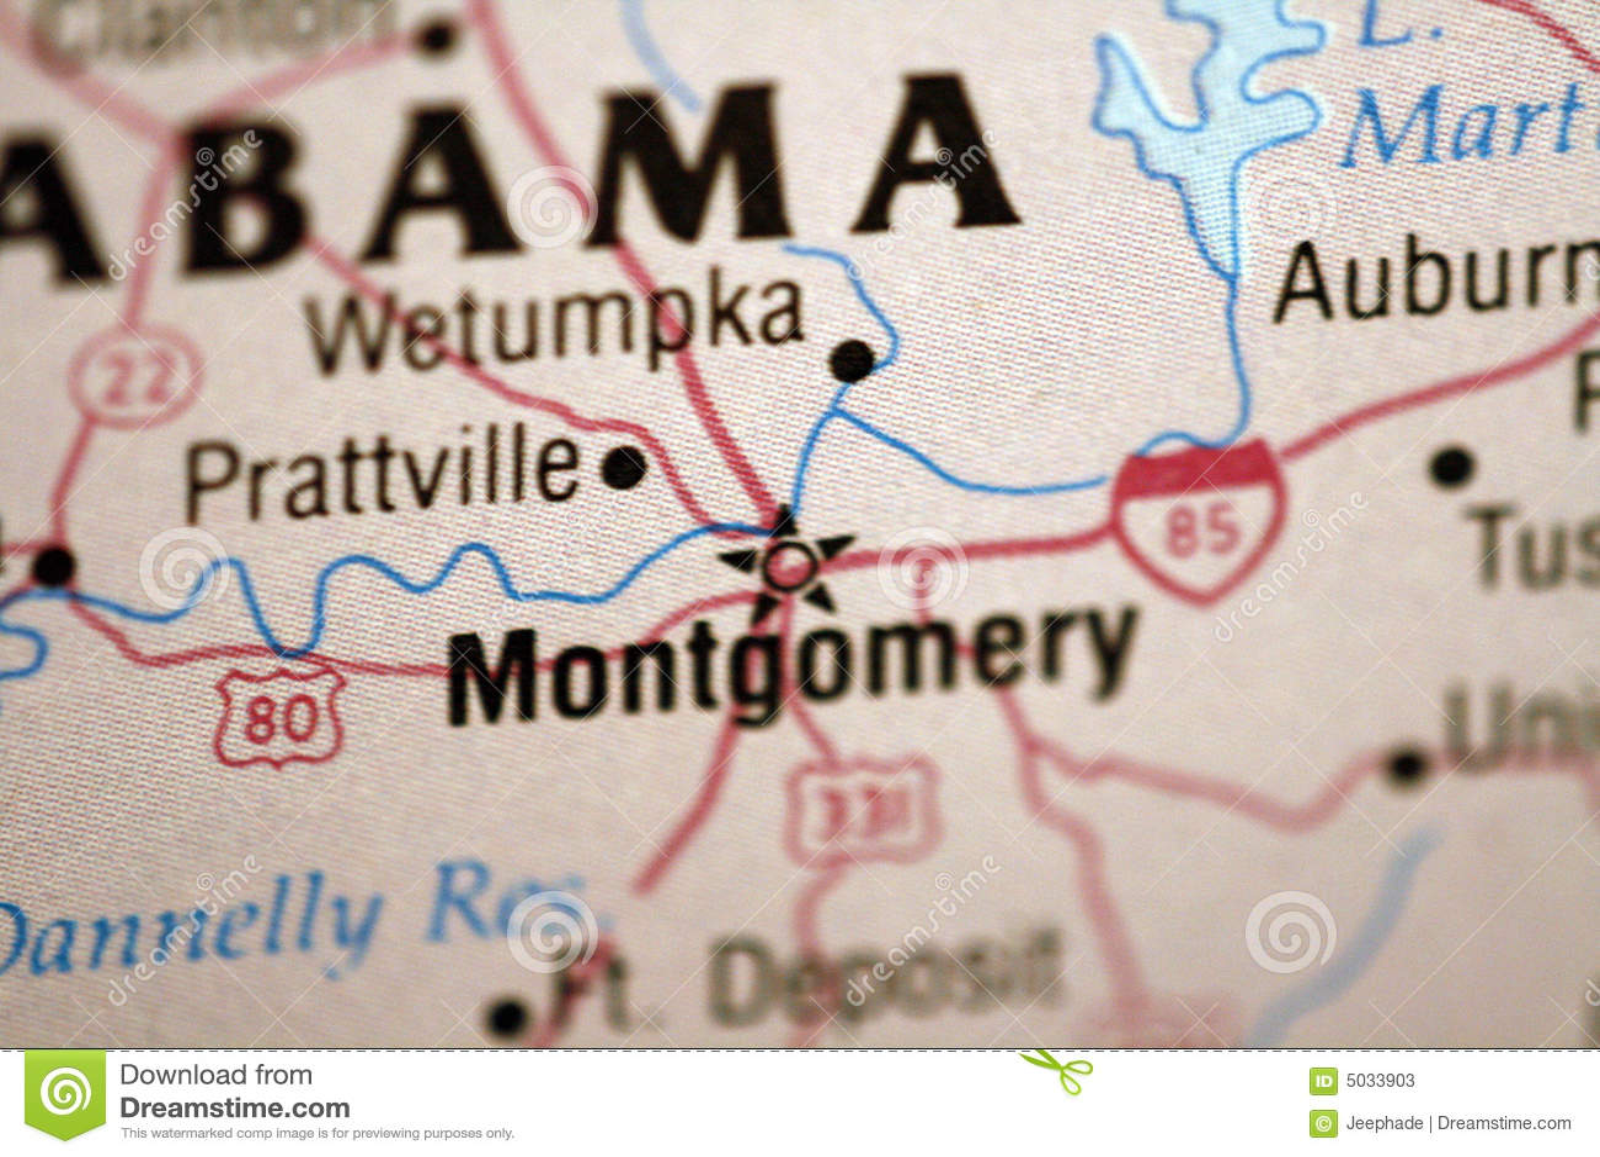 Alabama Interstate Highway Map Stock Illustration - Illustration of ...